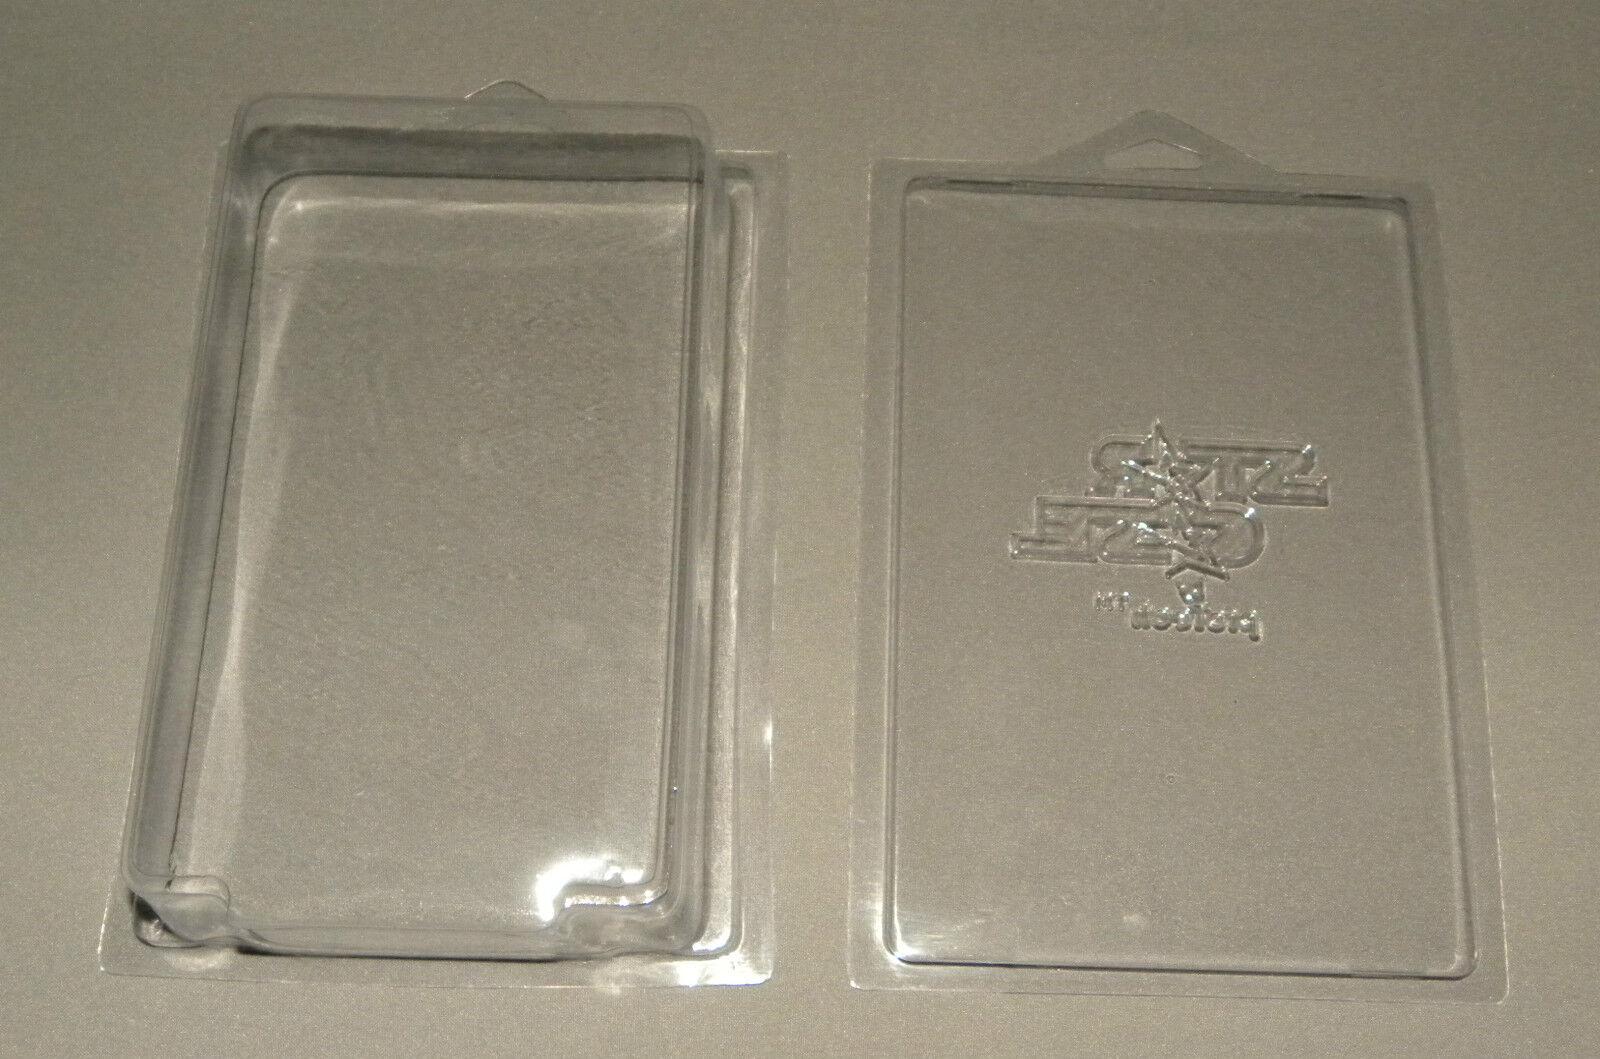 Predech Star Case Lot x 5 5 5 Action Figure GI Joe, Star Wars Predective Plastic NEW 7ffe39